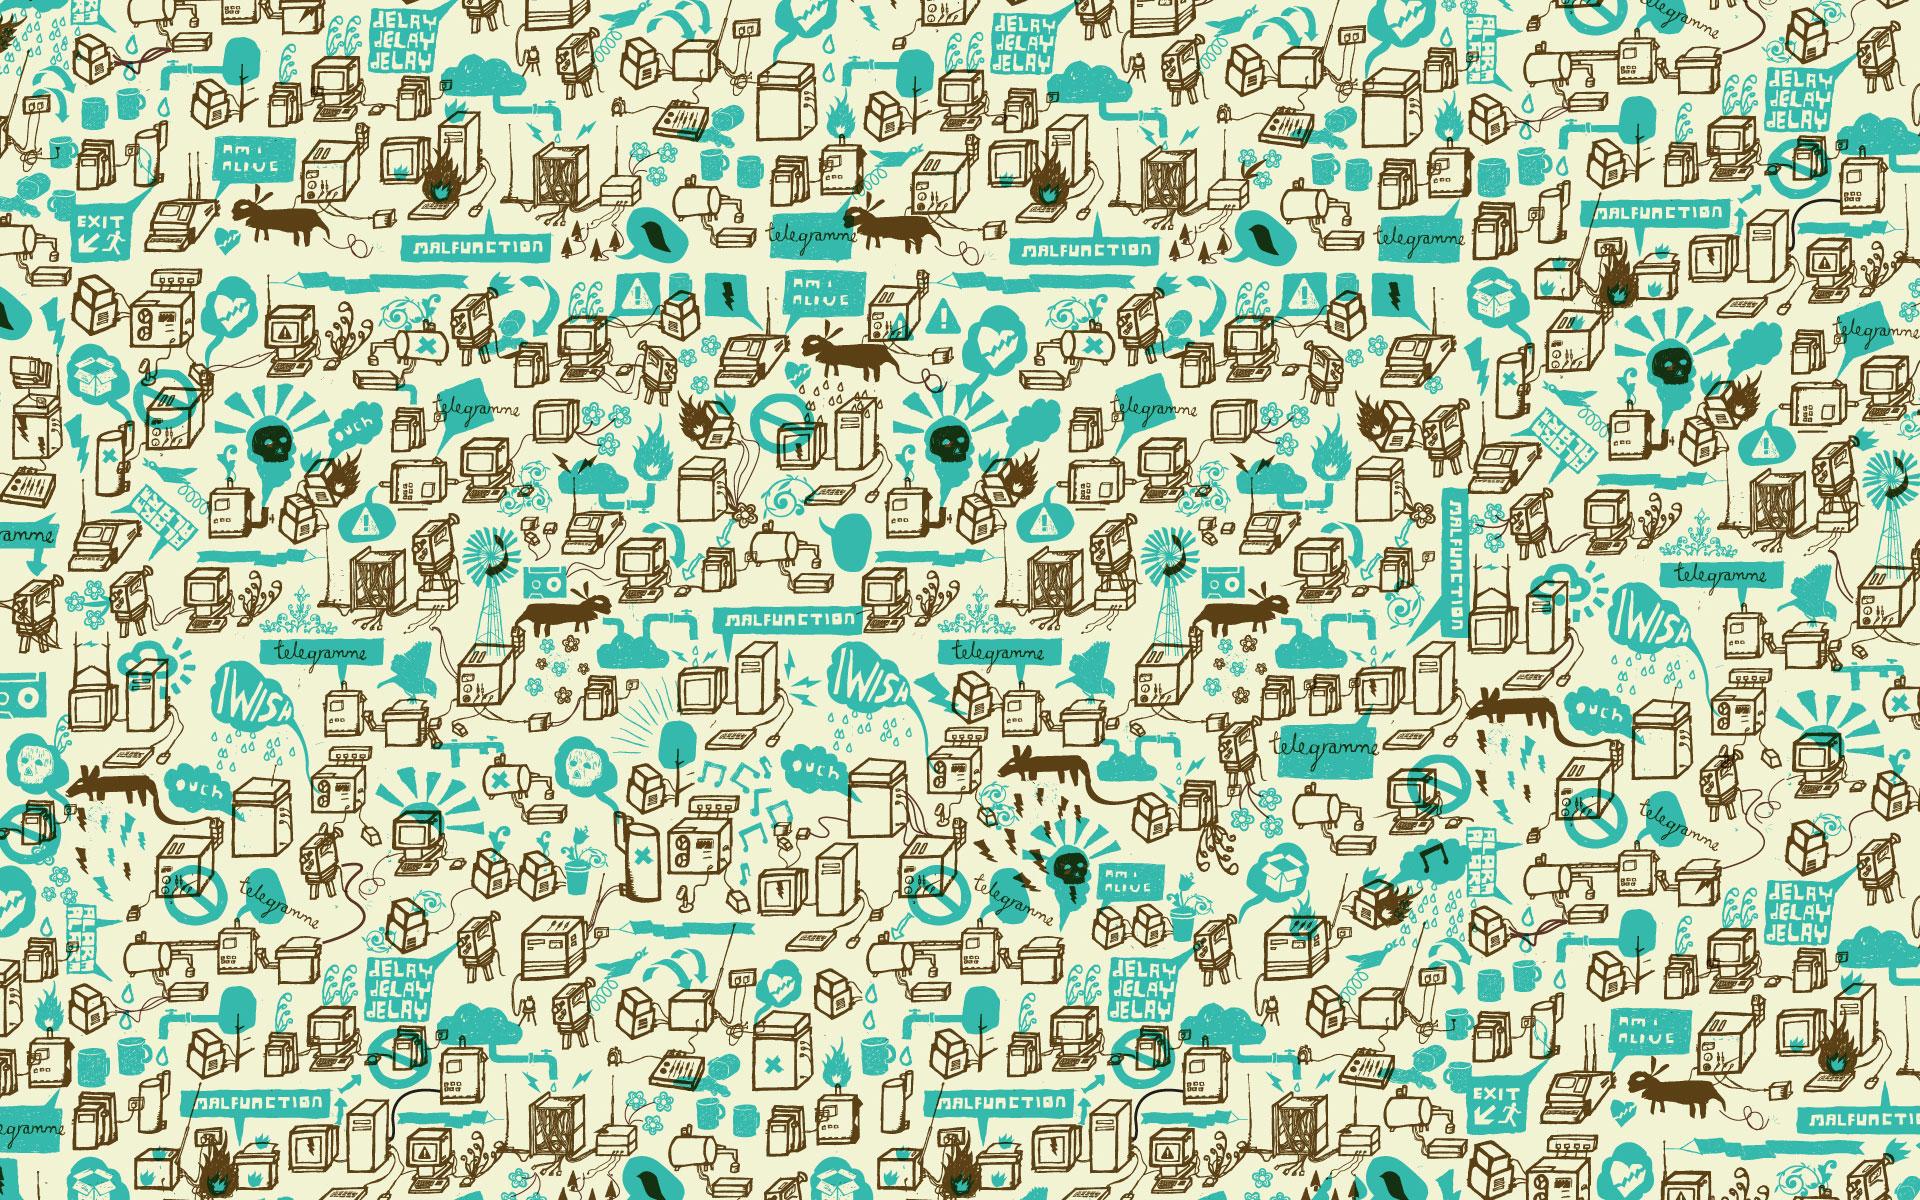 Computers Patterns Artwork Hd Wallpaper View Resize And Free Download Wallpaperjam Com